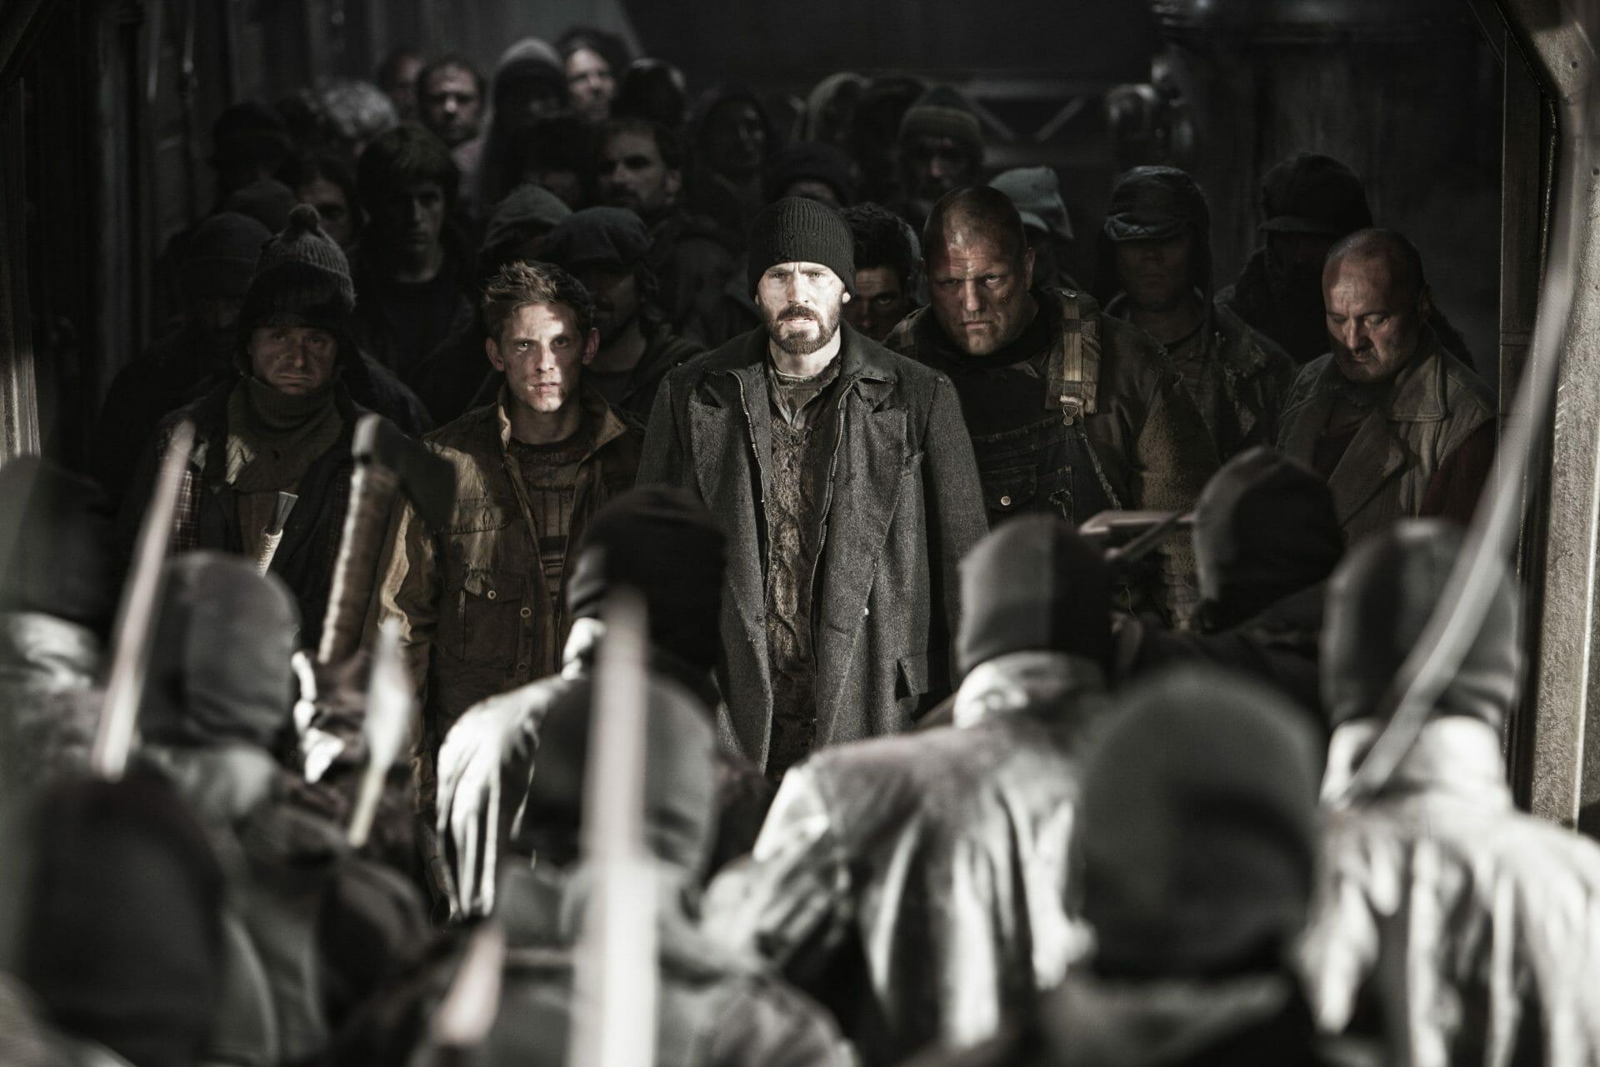 The Top Ten Winter Misery Genre Movies - Snowpiercer (2013)